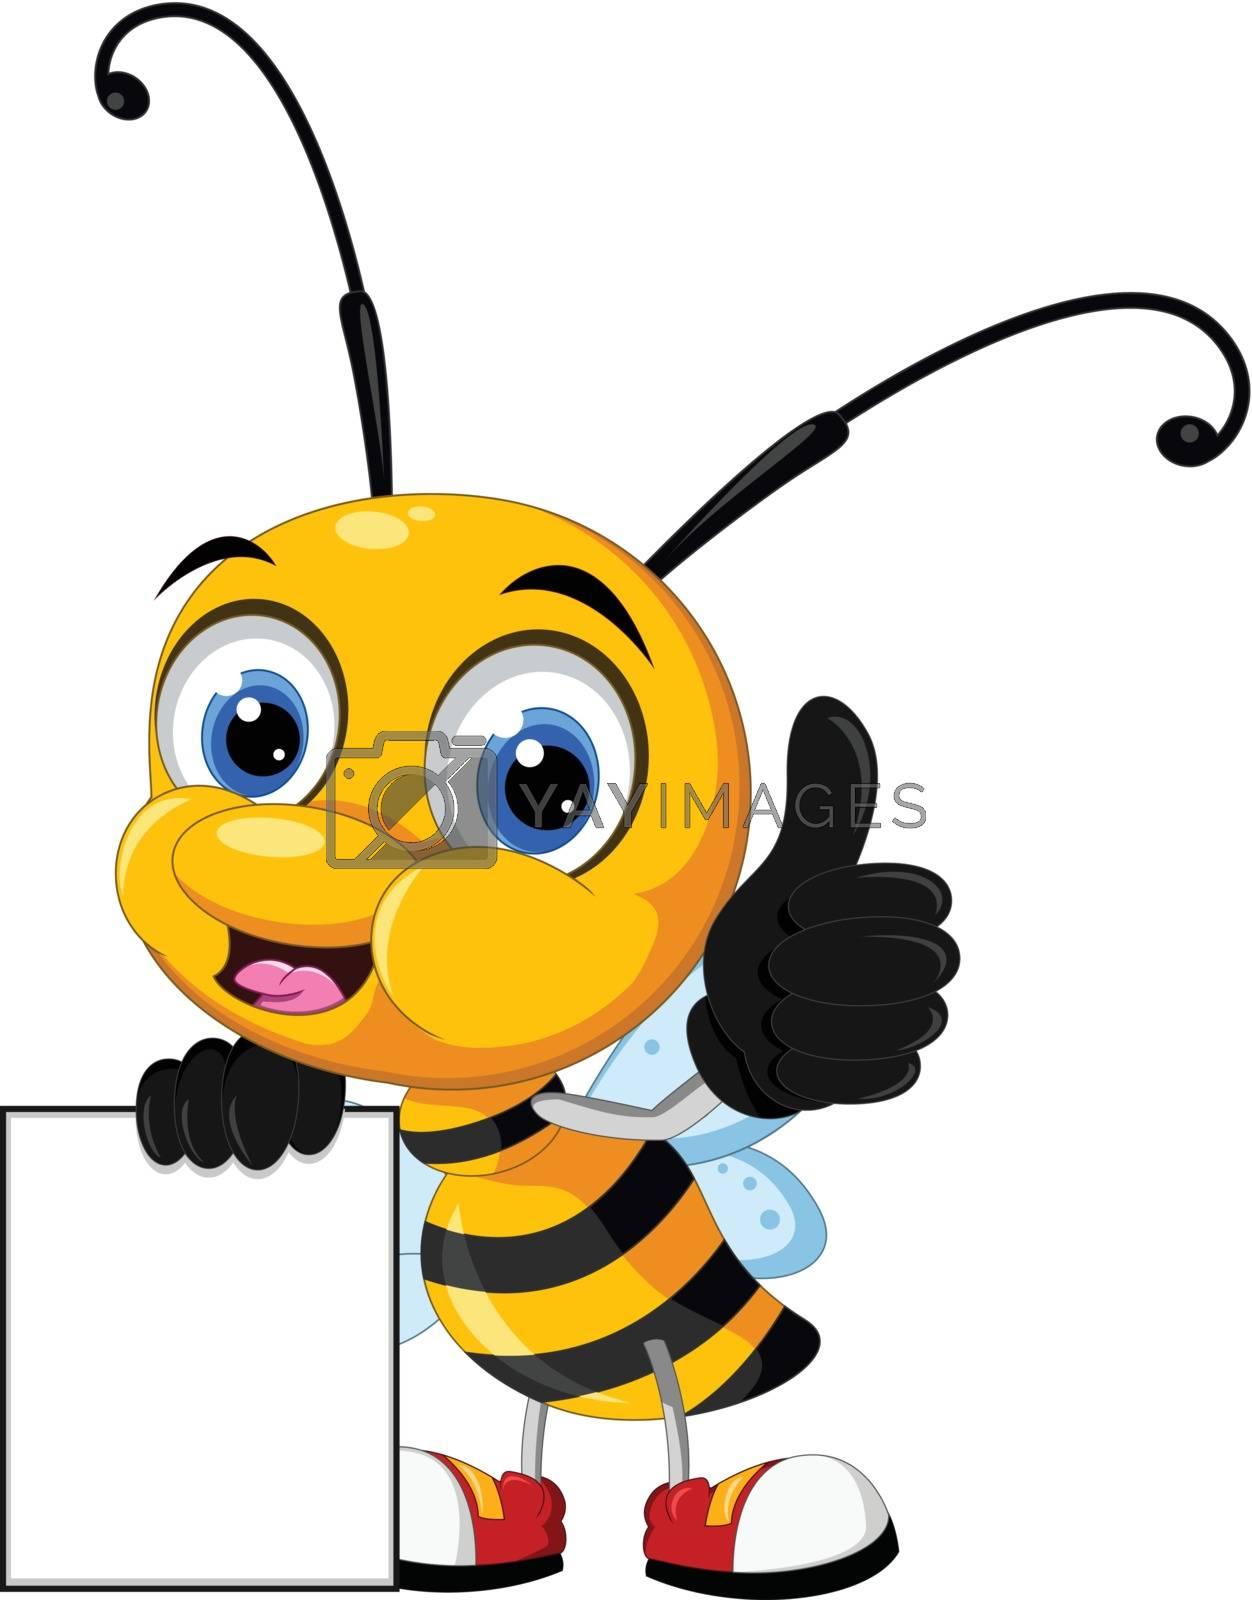 Royalty free image of little bee cartoon holding blank board by sujono